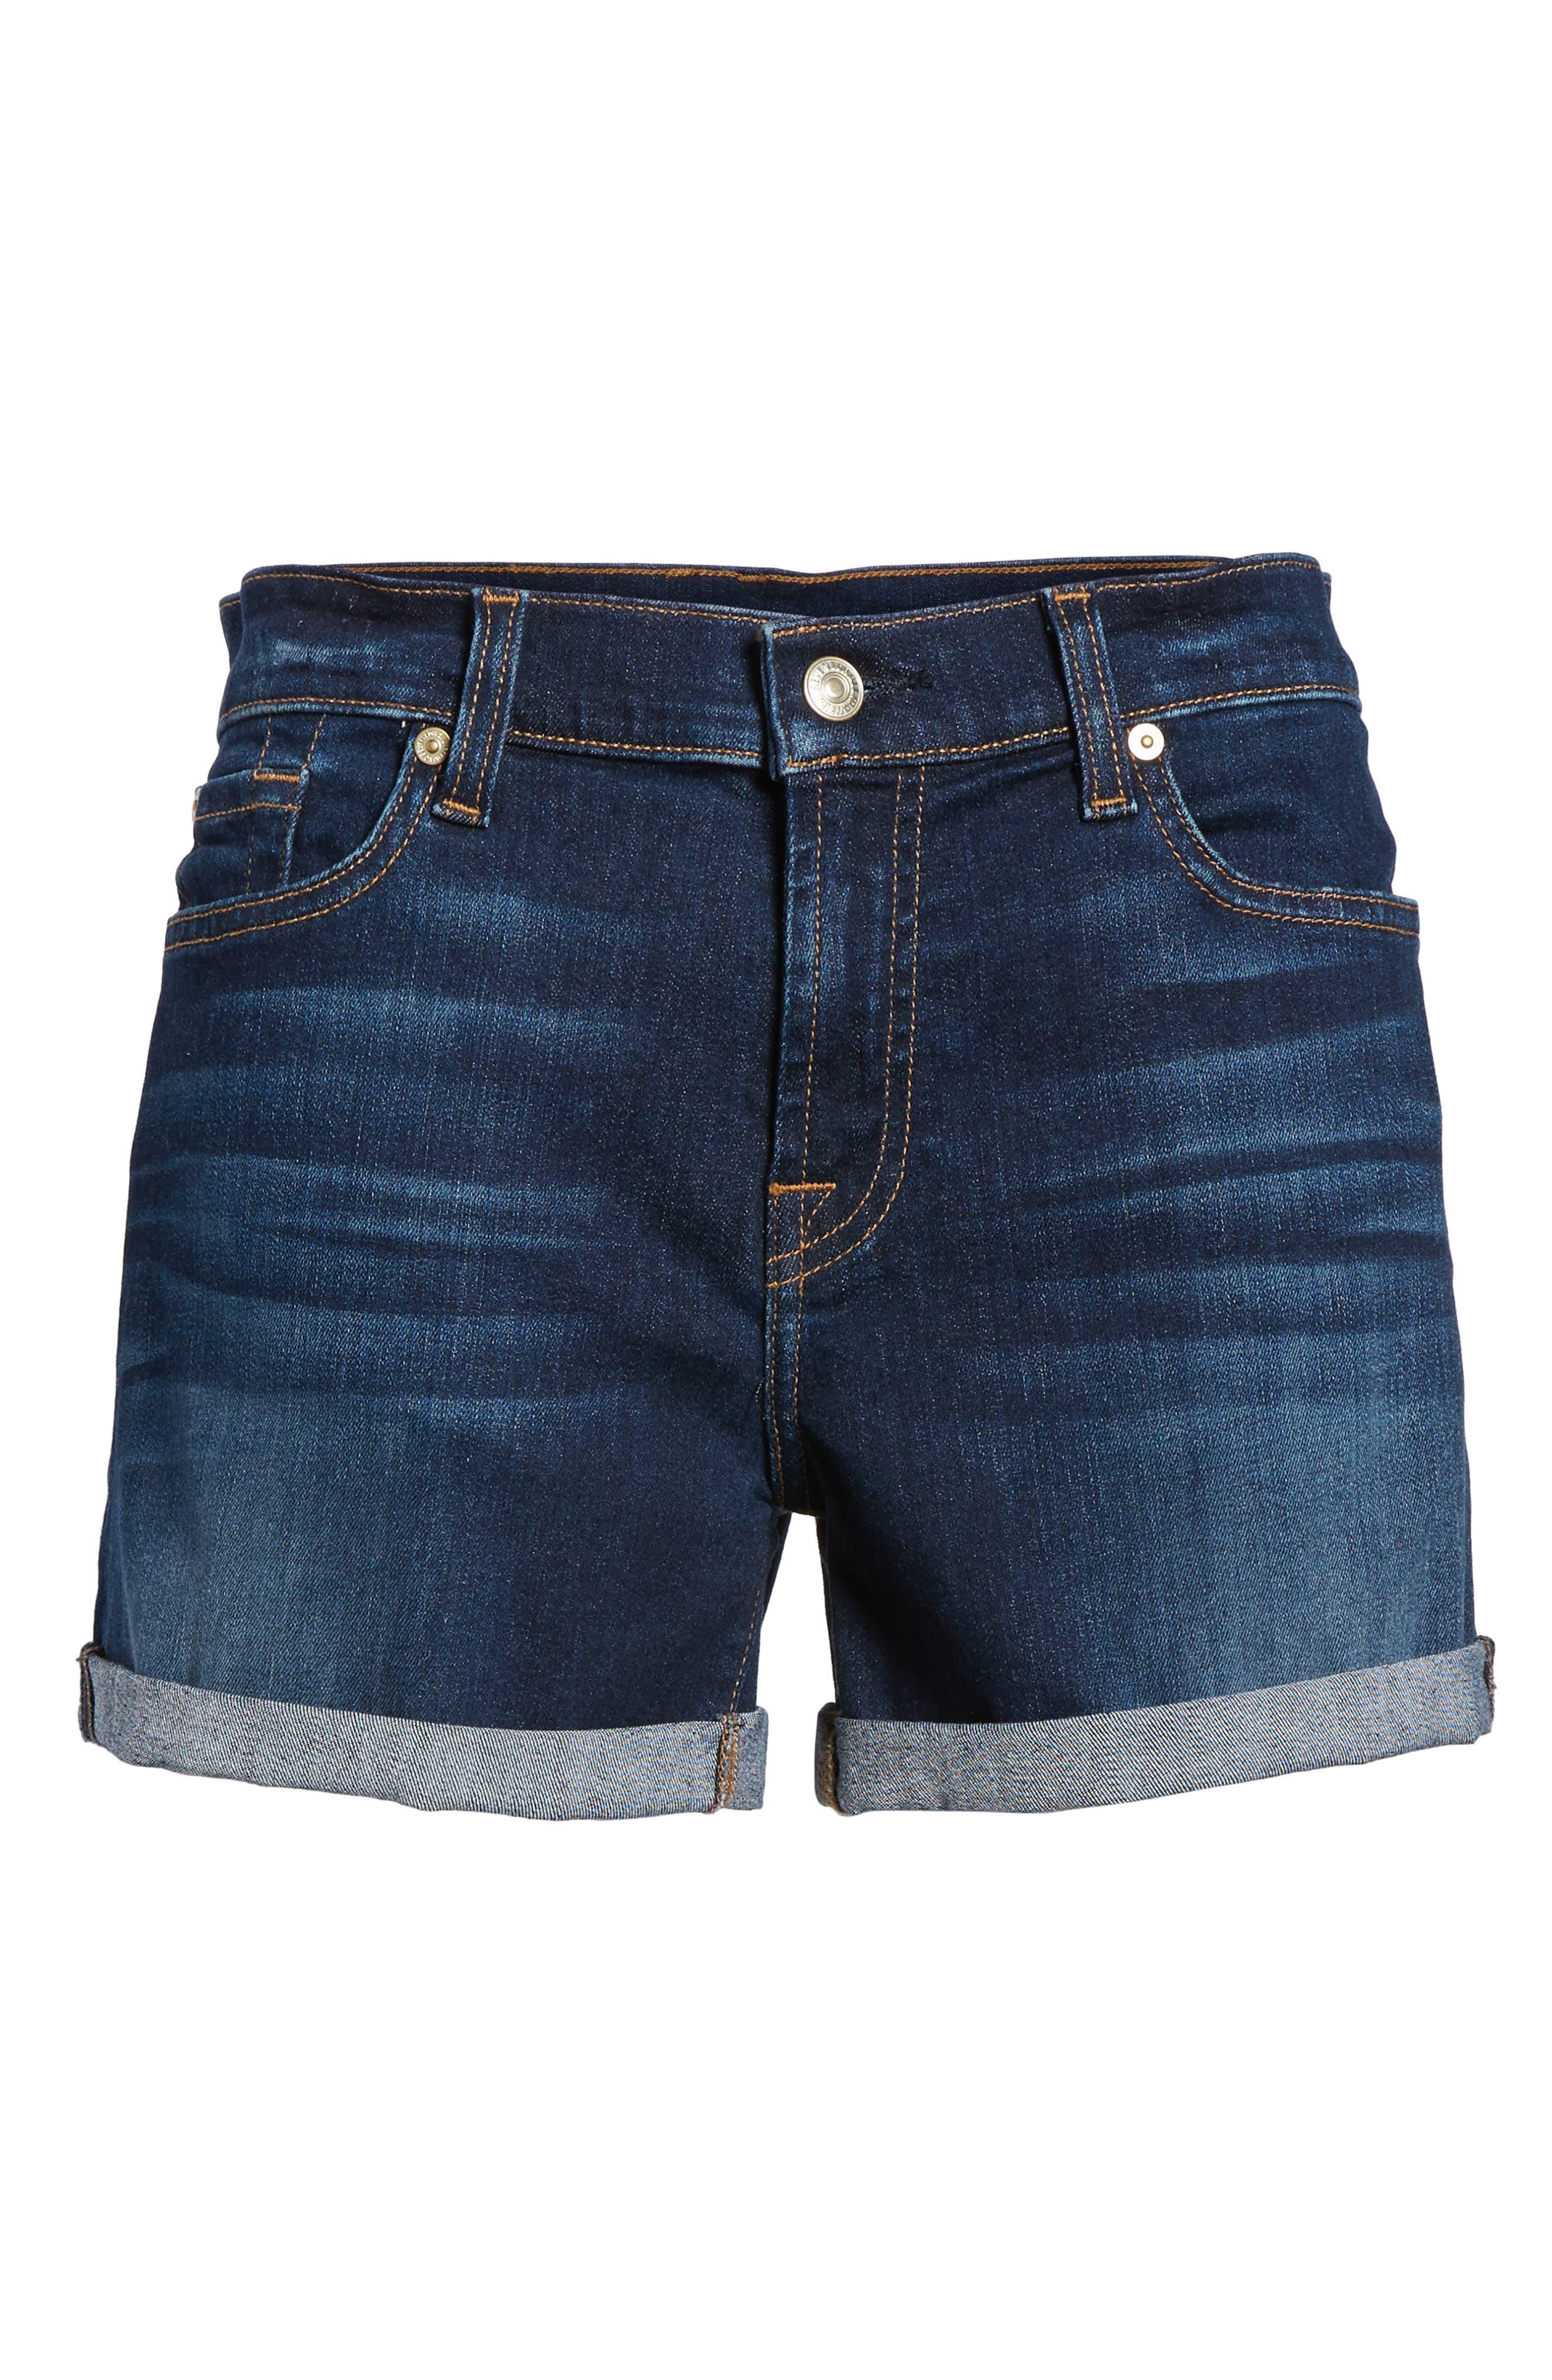 7 FOR ALL MANKIND<SUP>®</SUP>, b(air) Cuffed Denim Shorts, Alternate thumbnail 7, color, MORENO